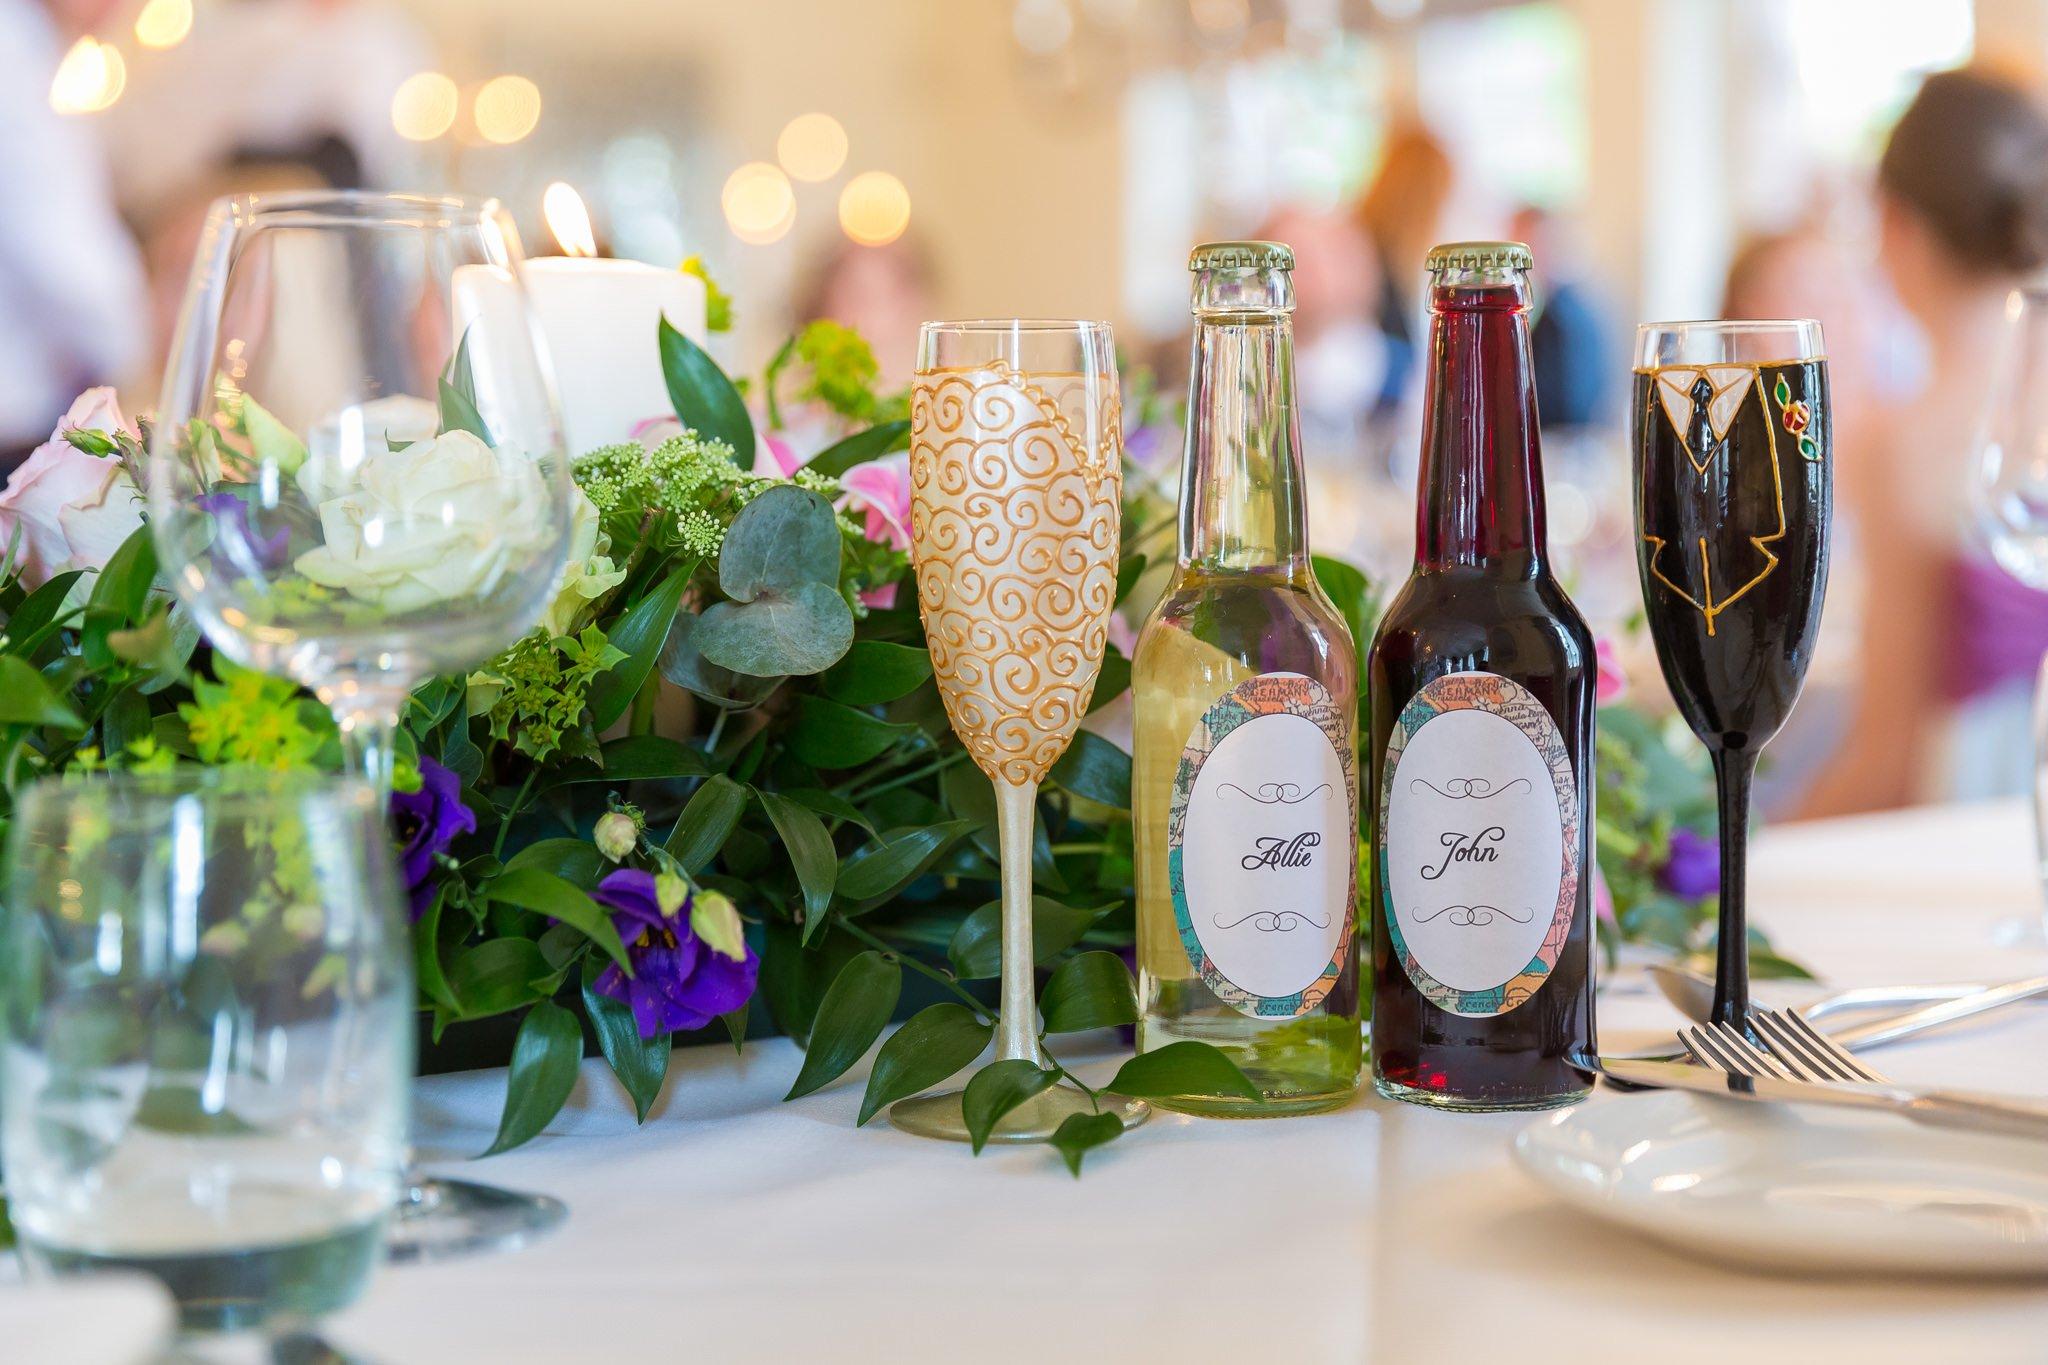 Home made wedding drinks